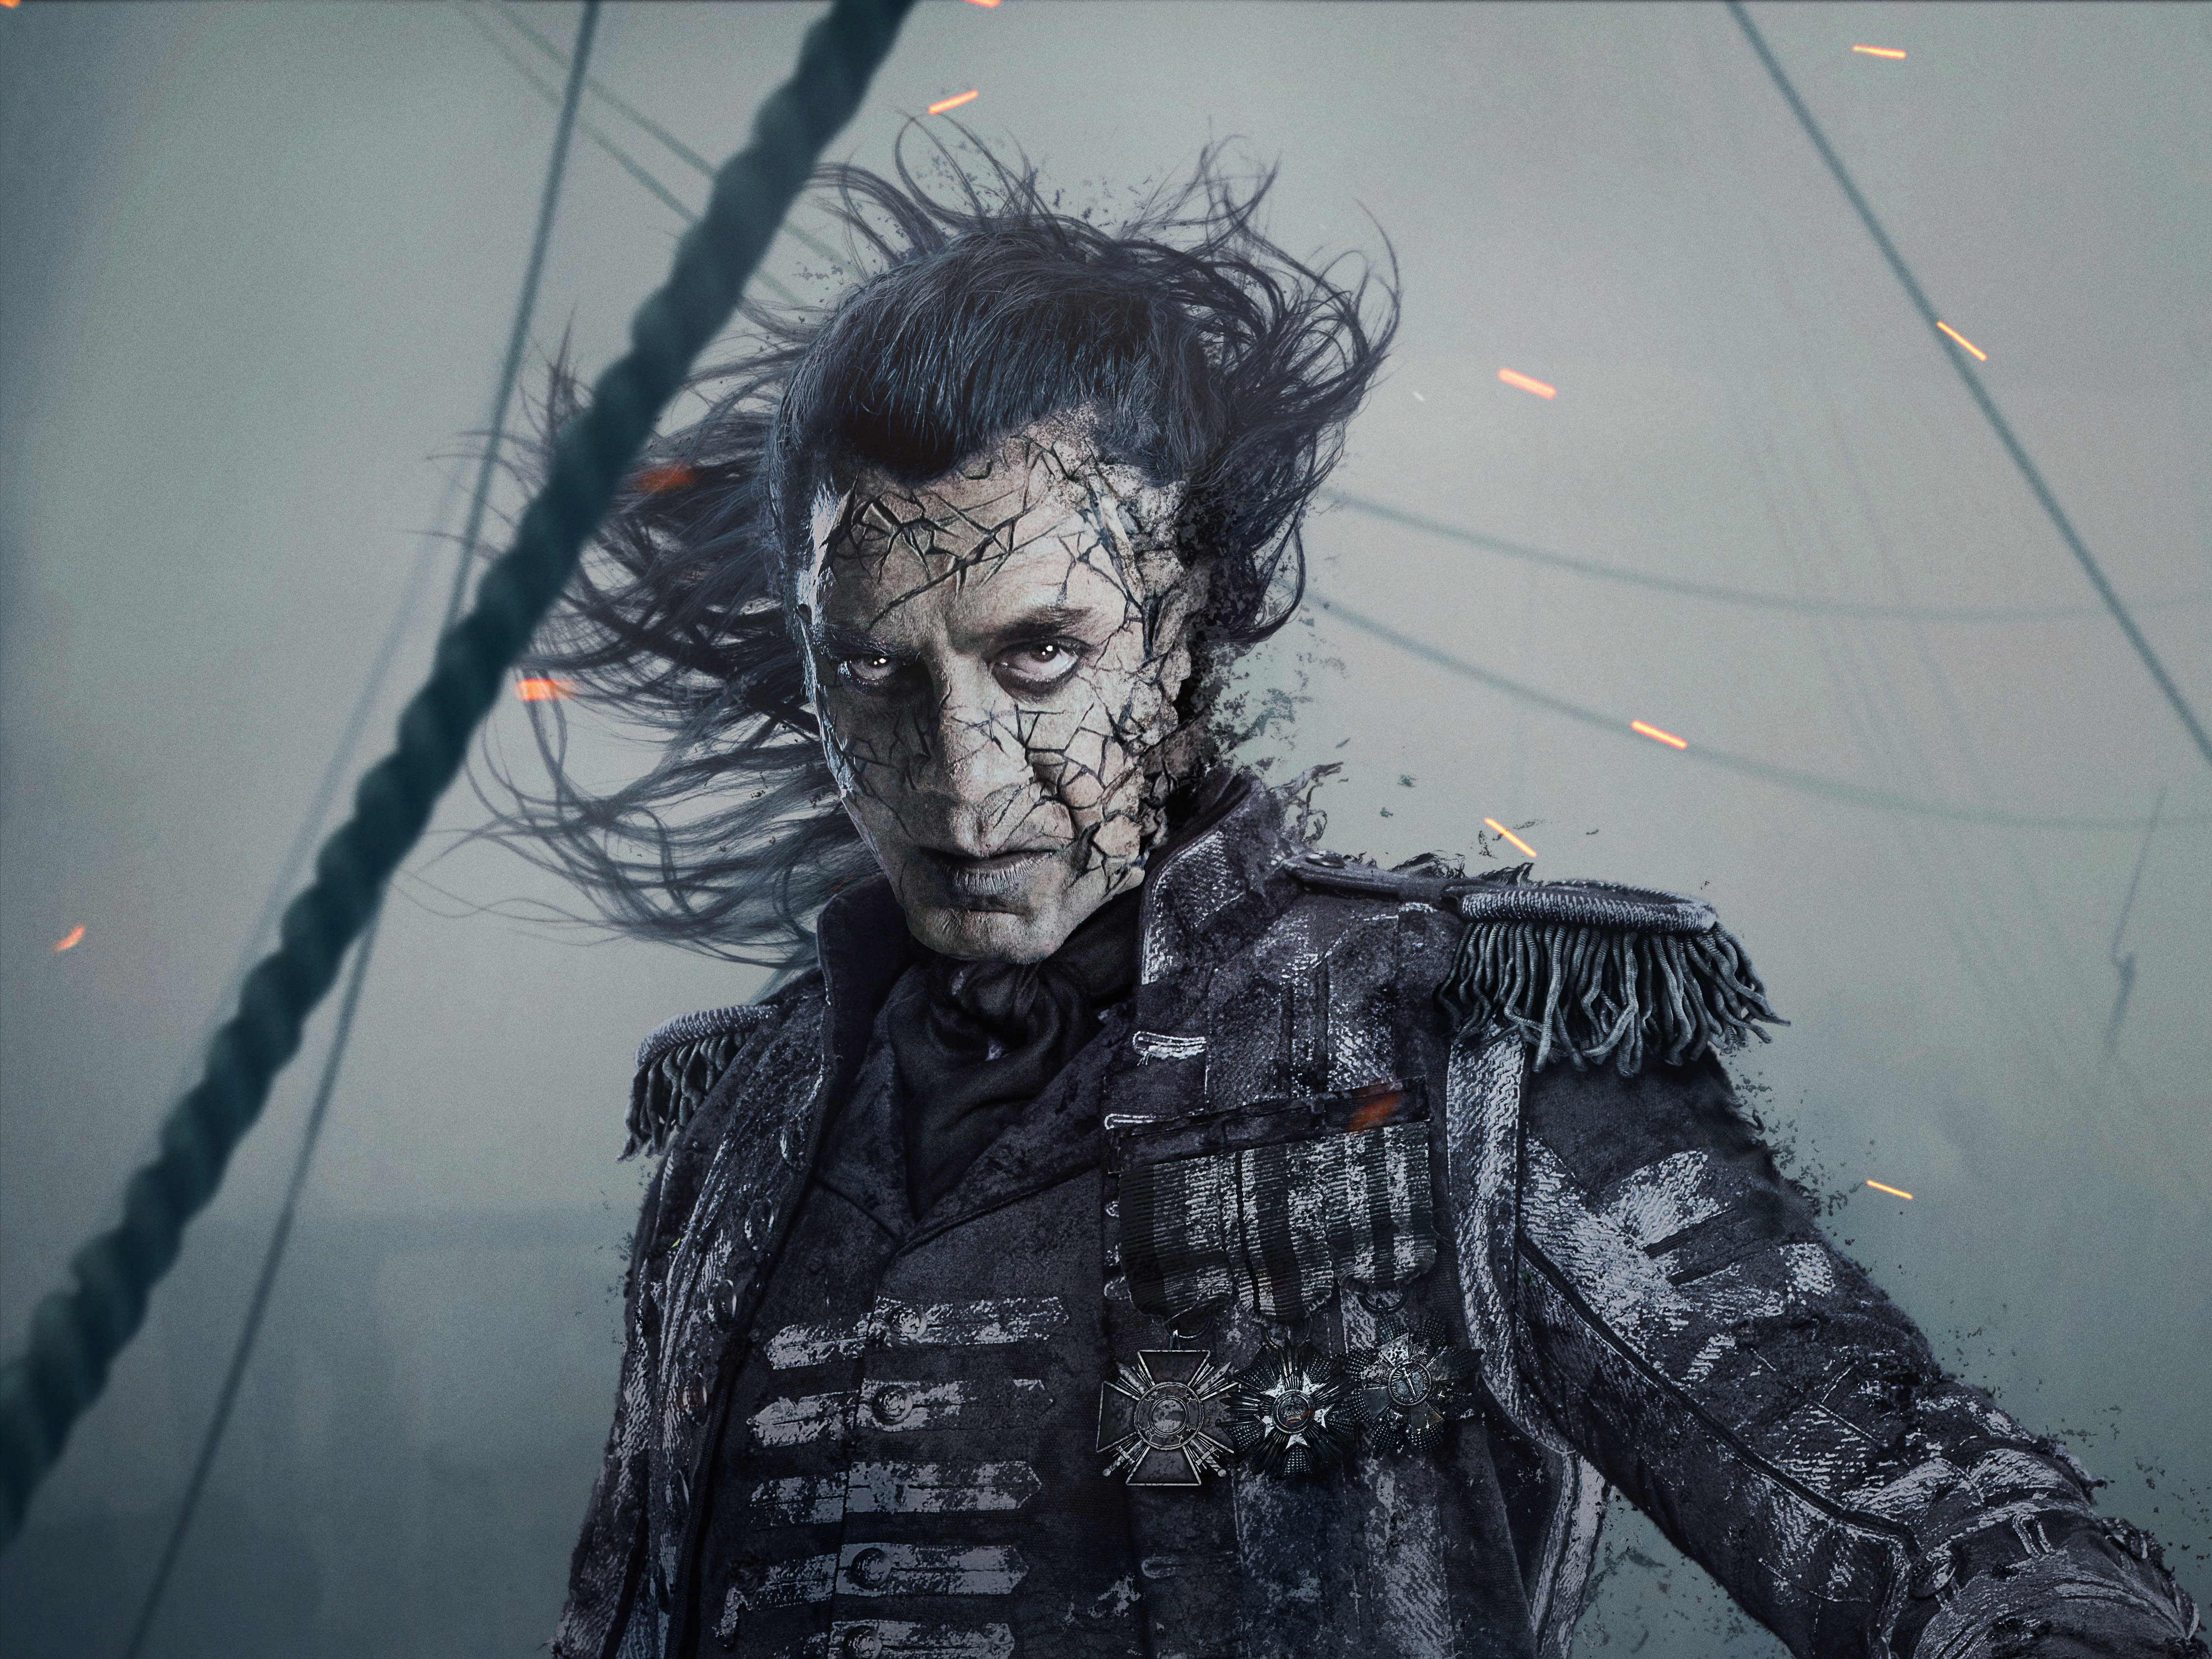 Dead Men Tell No Tales Wallpaper: 1080x1920 Captain Salaza In Pirates Of The Caribbean Dead